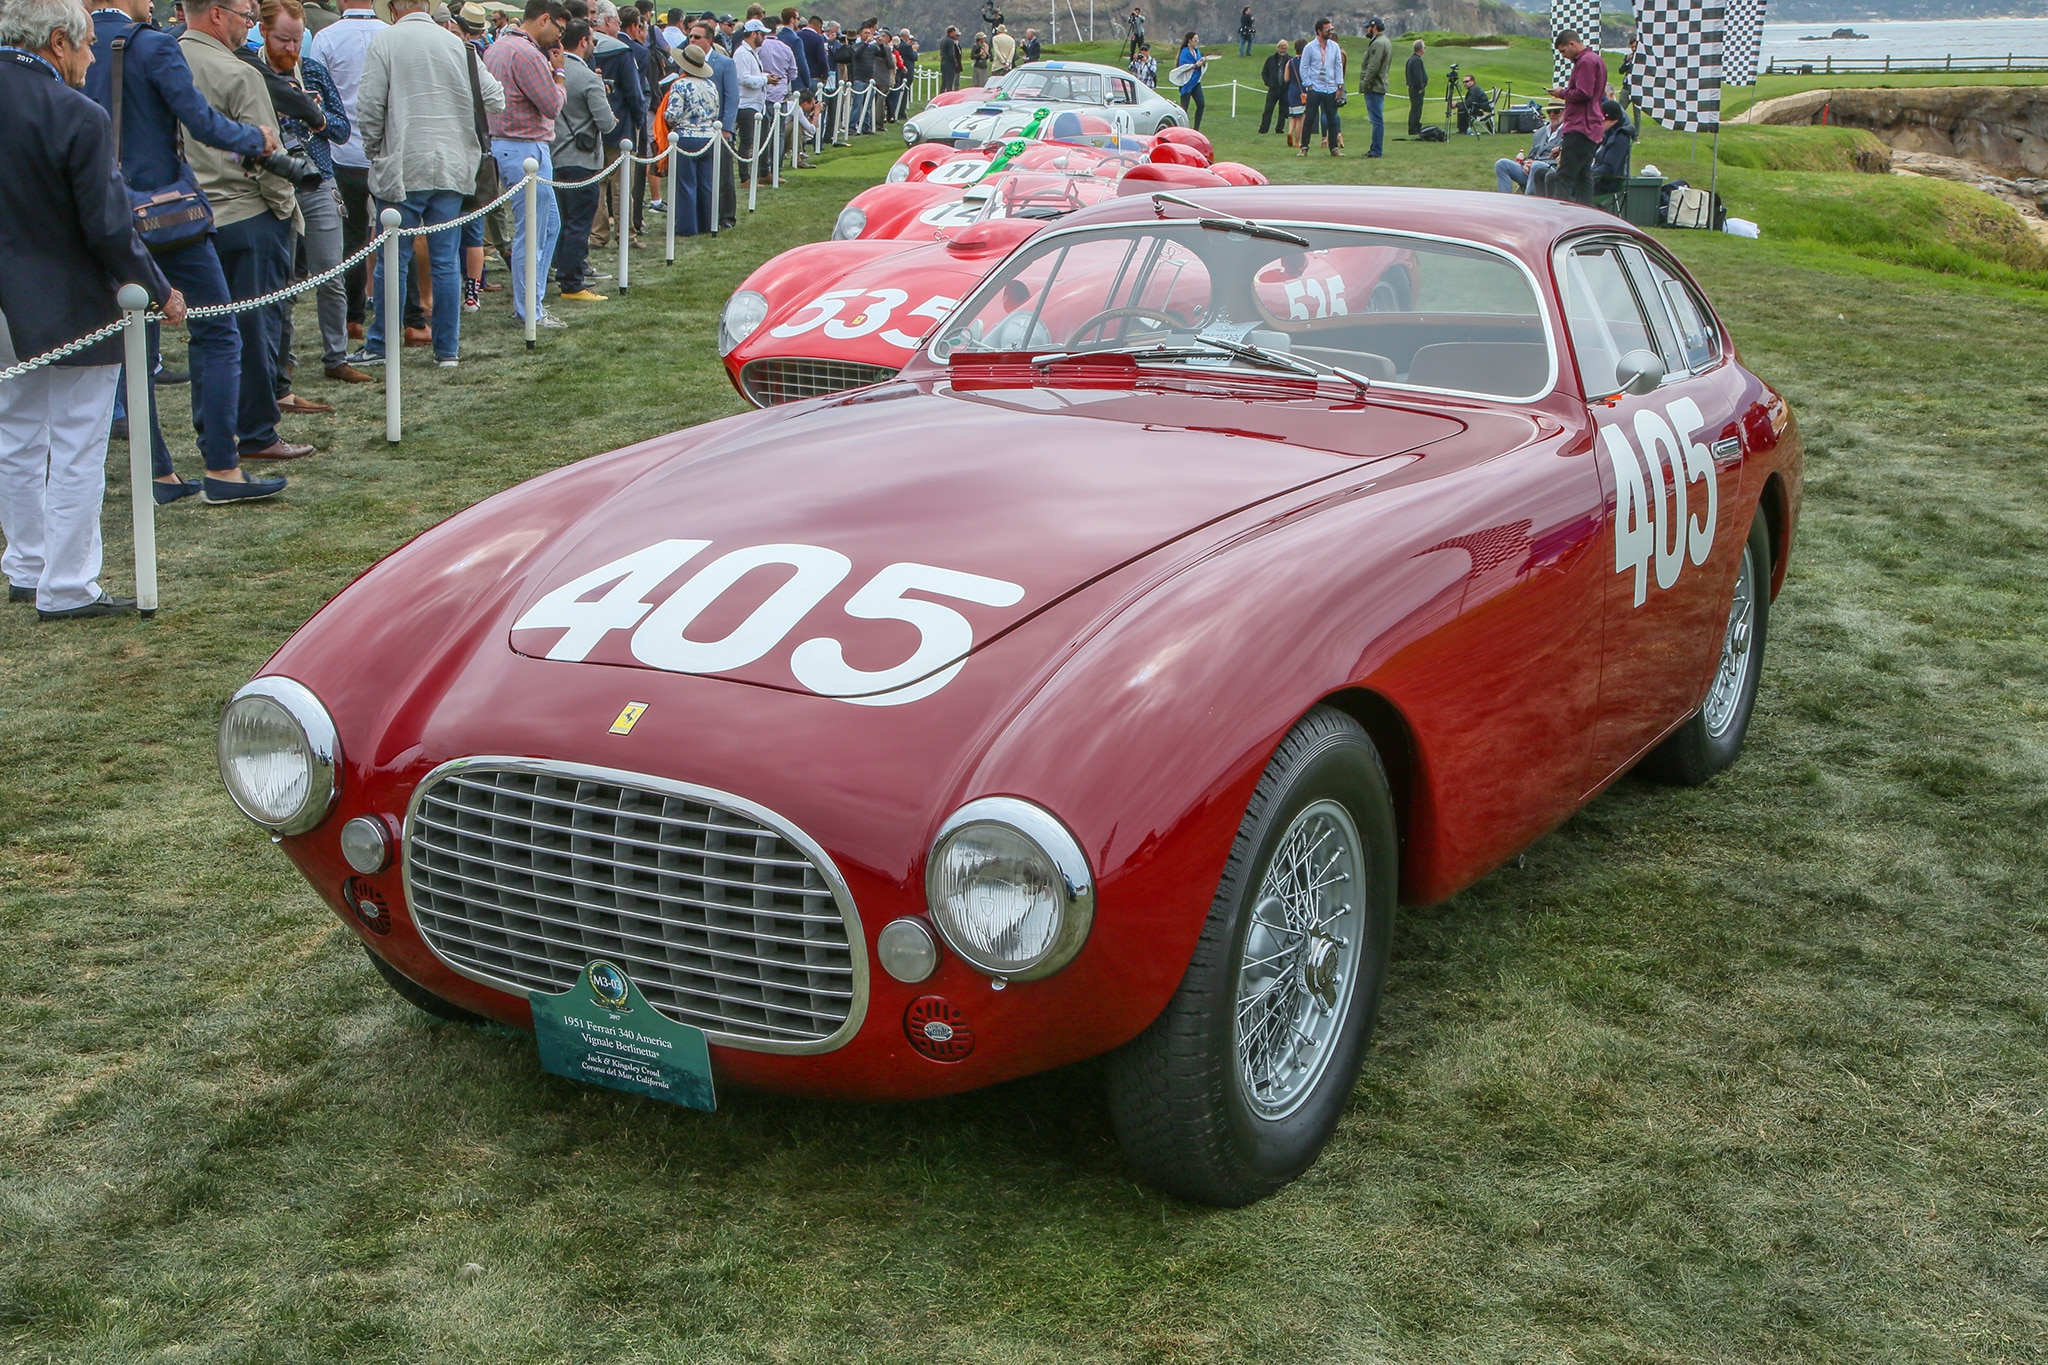 18 Favorite Ferraris From The 2017 Pebble Beach Concours D